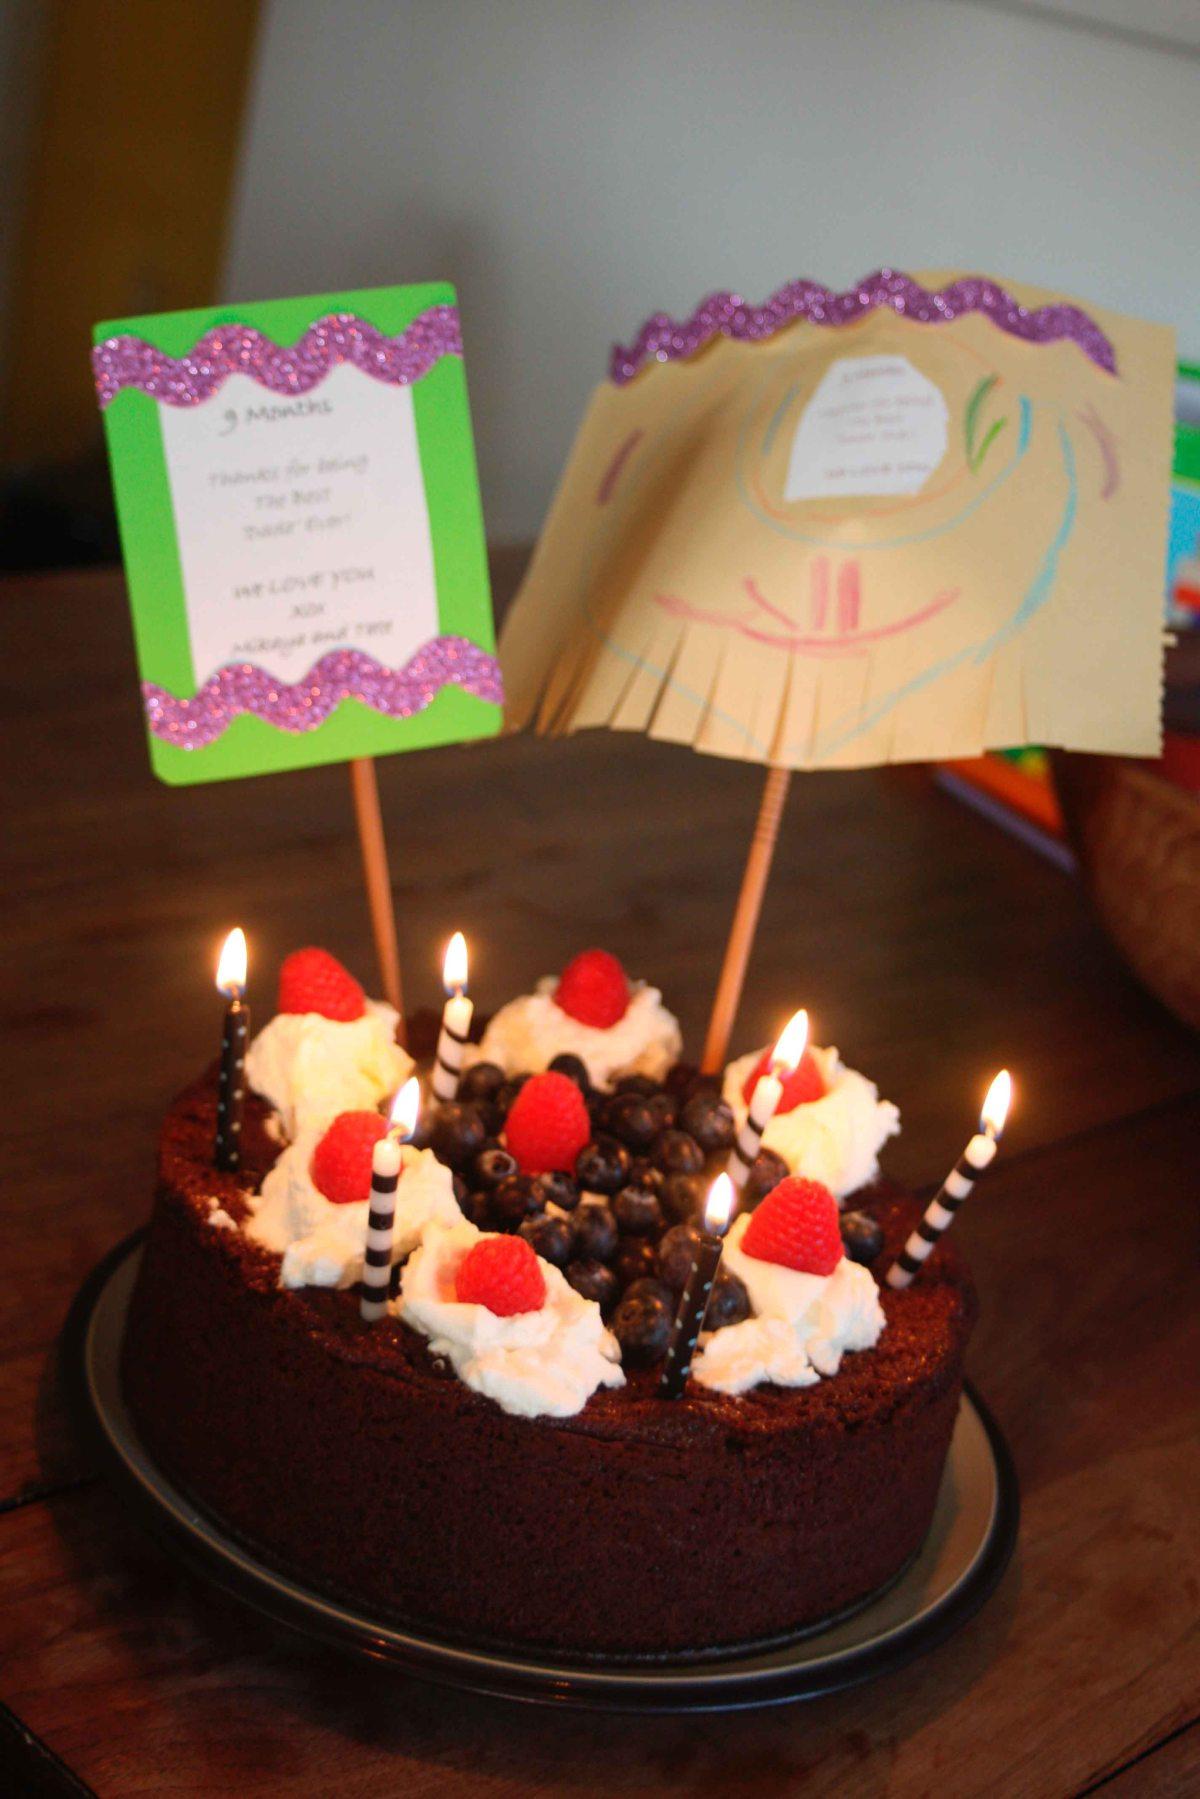 DADA's cake